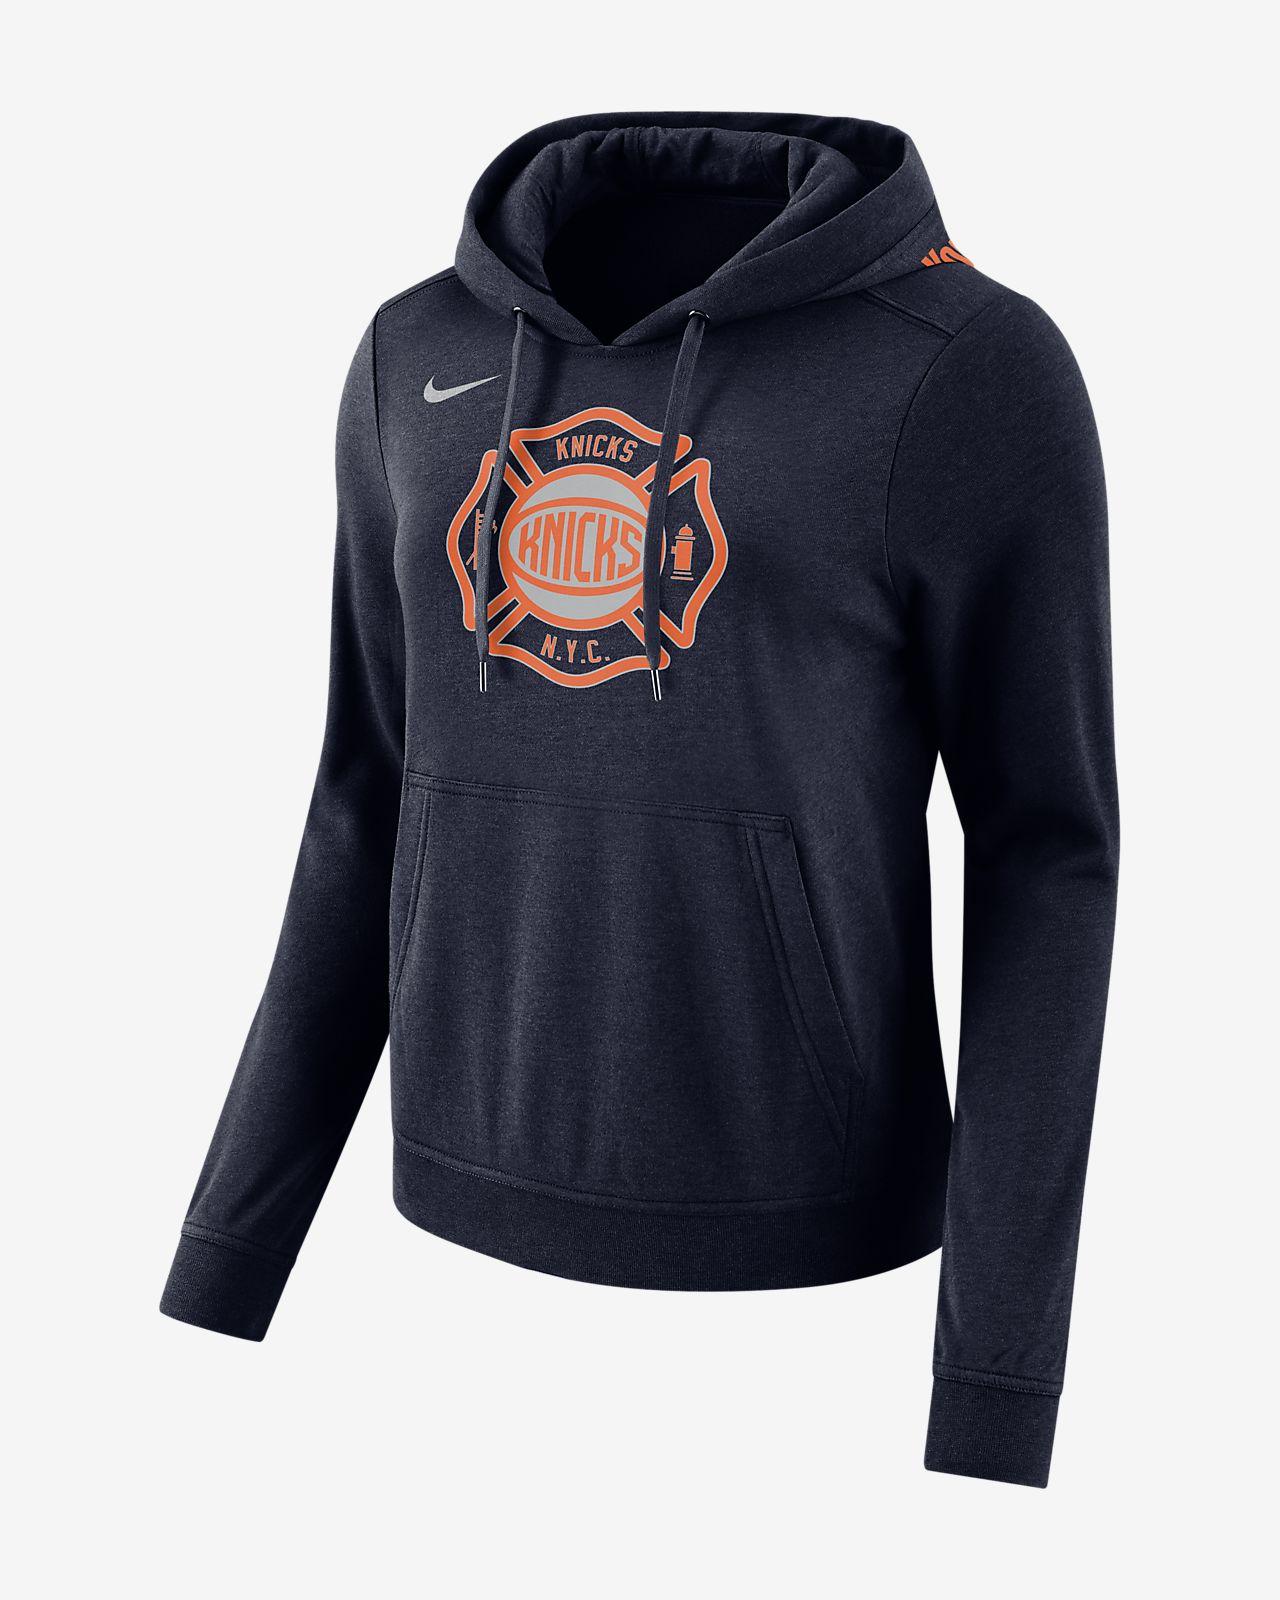 ... New York Knicks City Edition Nike Women's NBA Hoodie